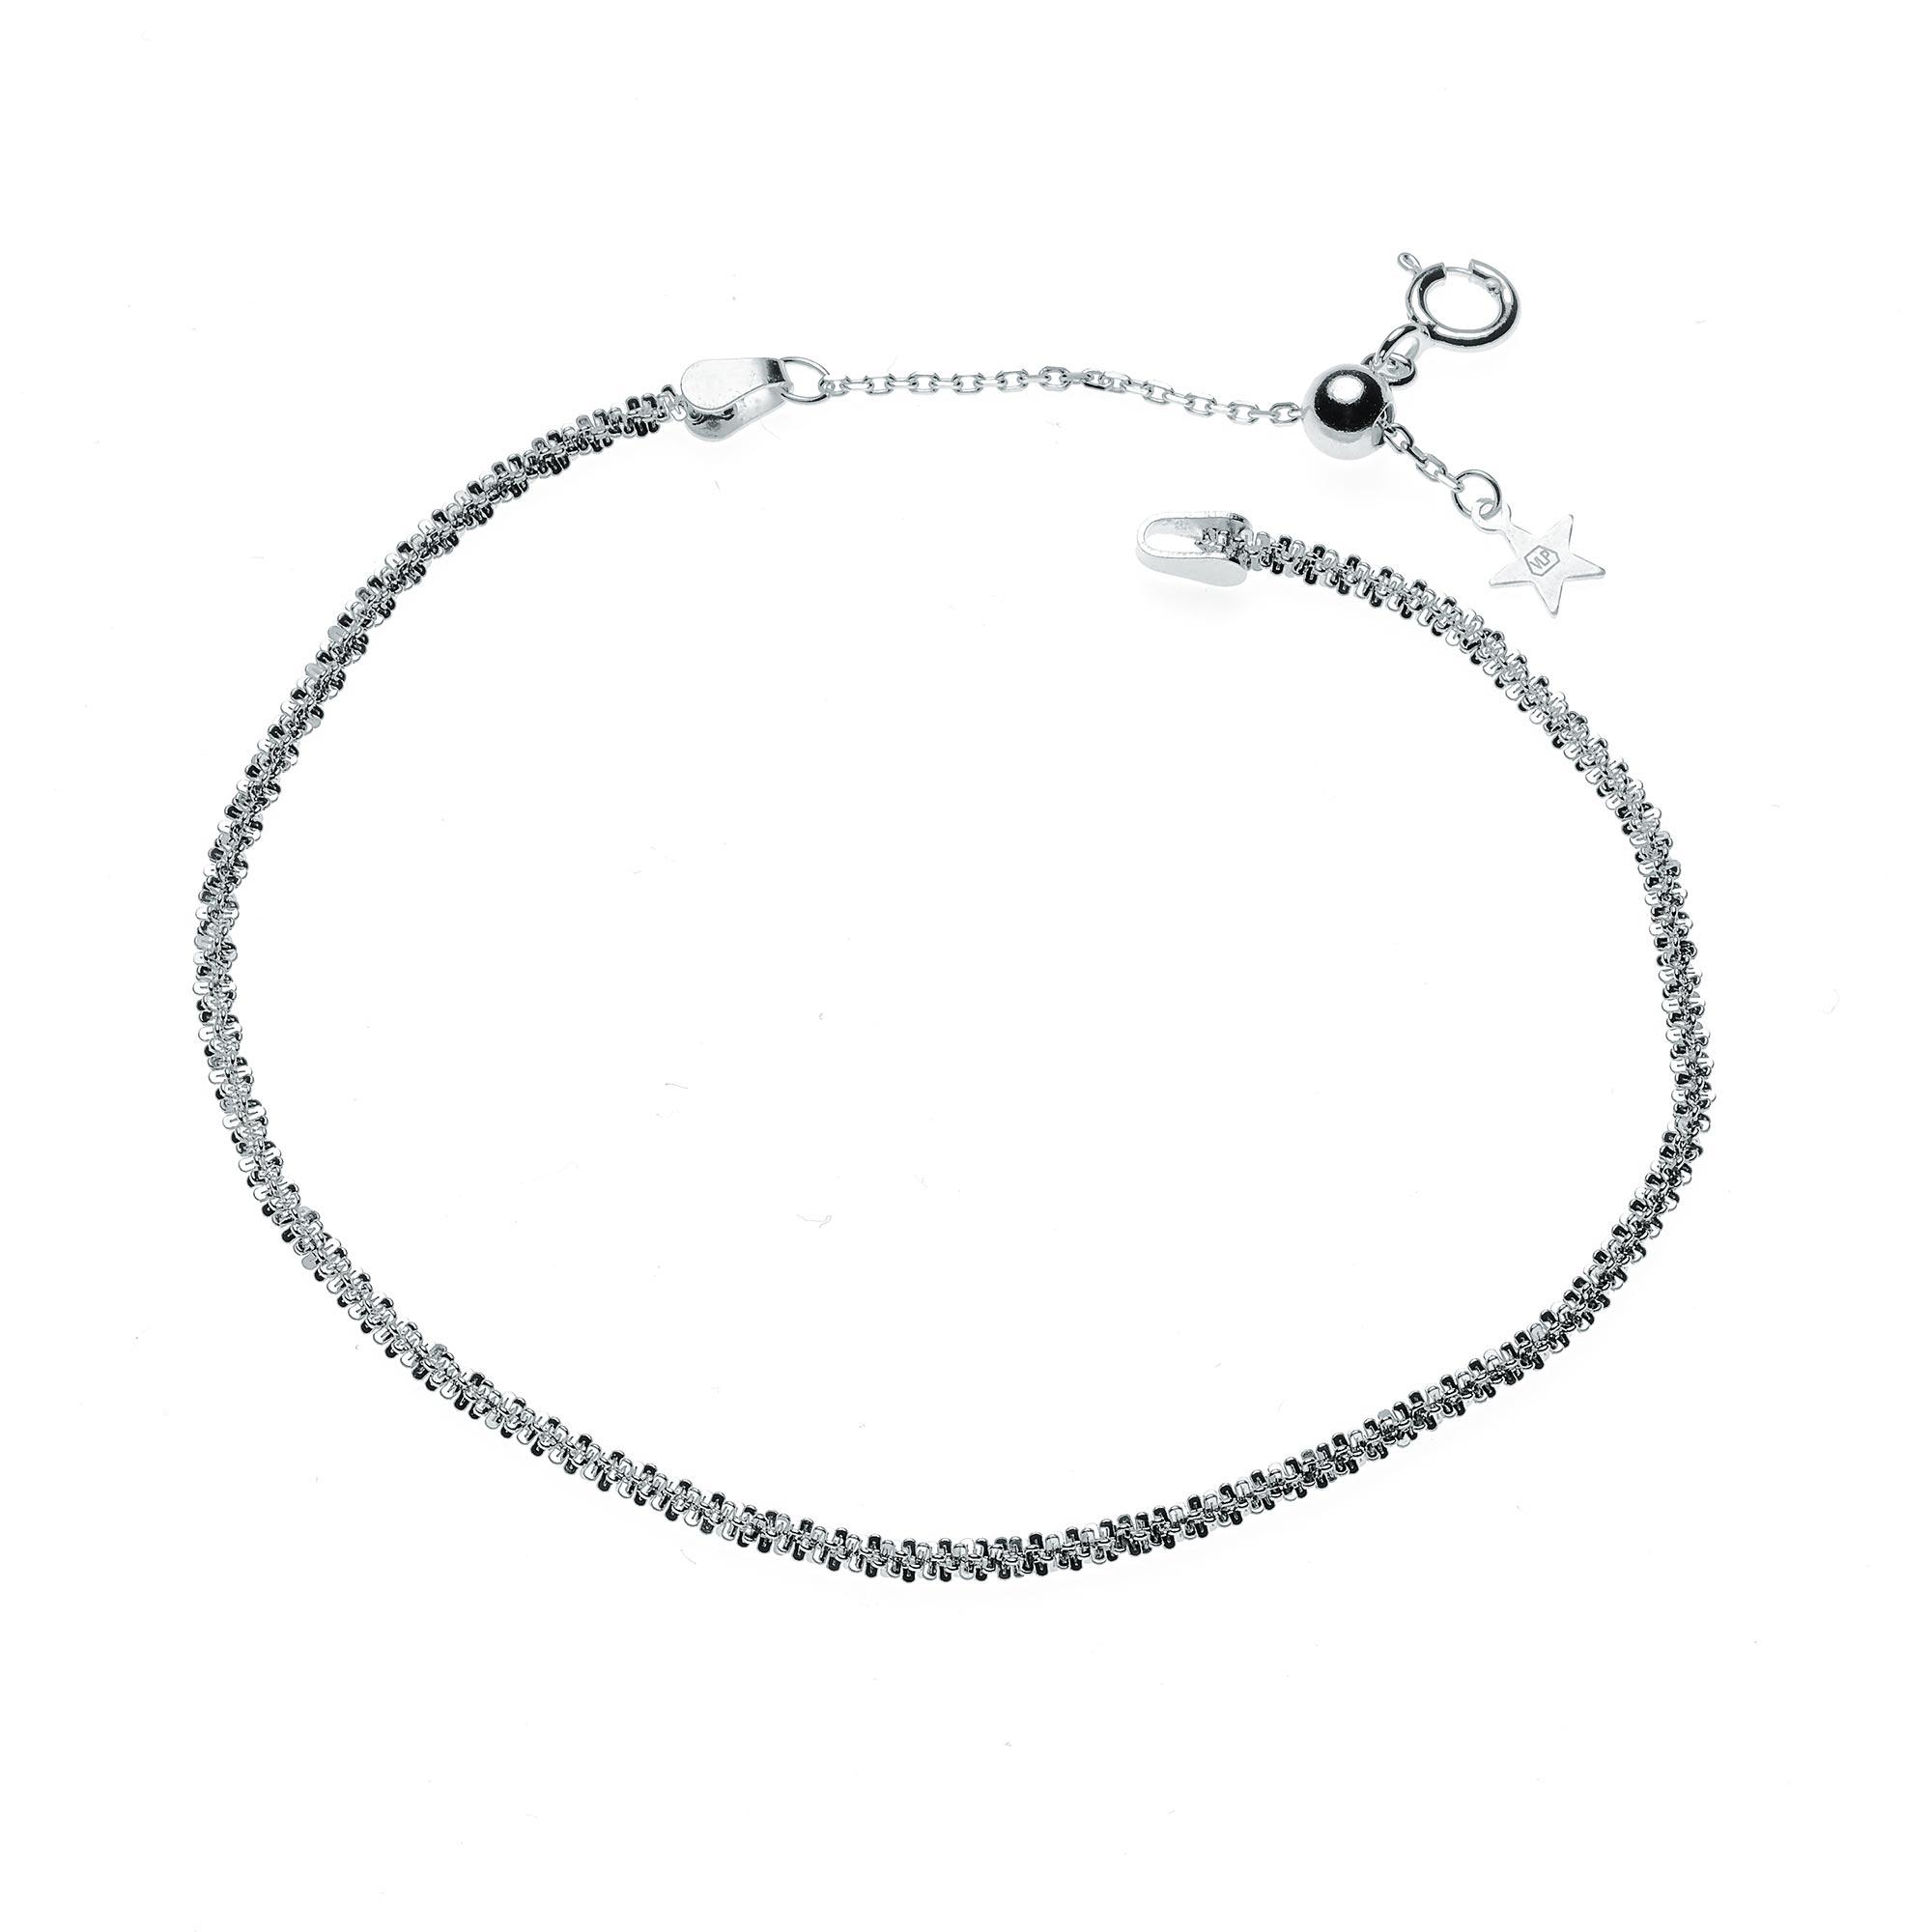 Dámský stříbrný náramek NB-1051